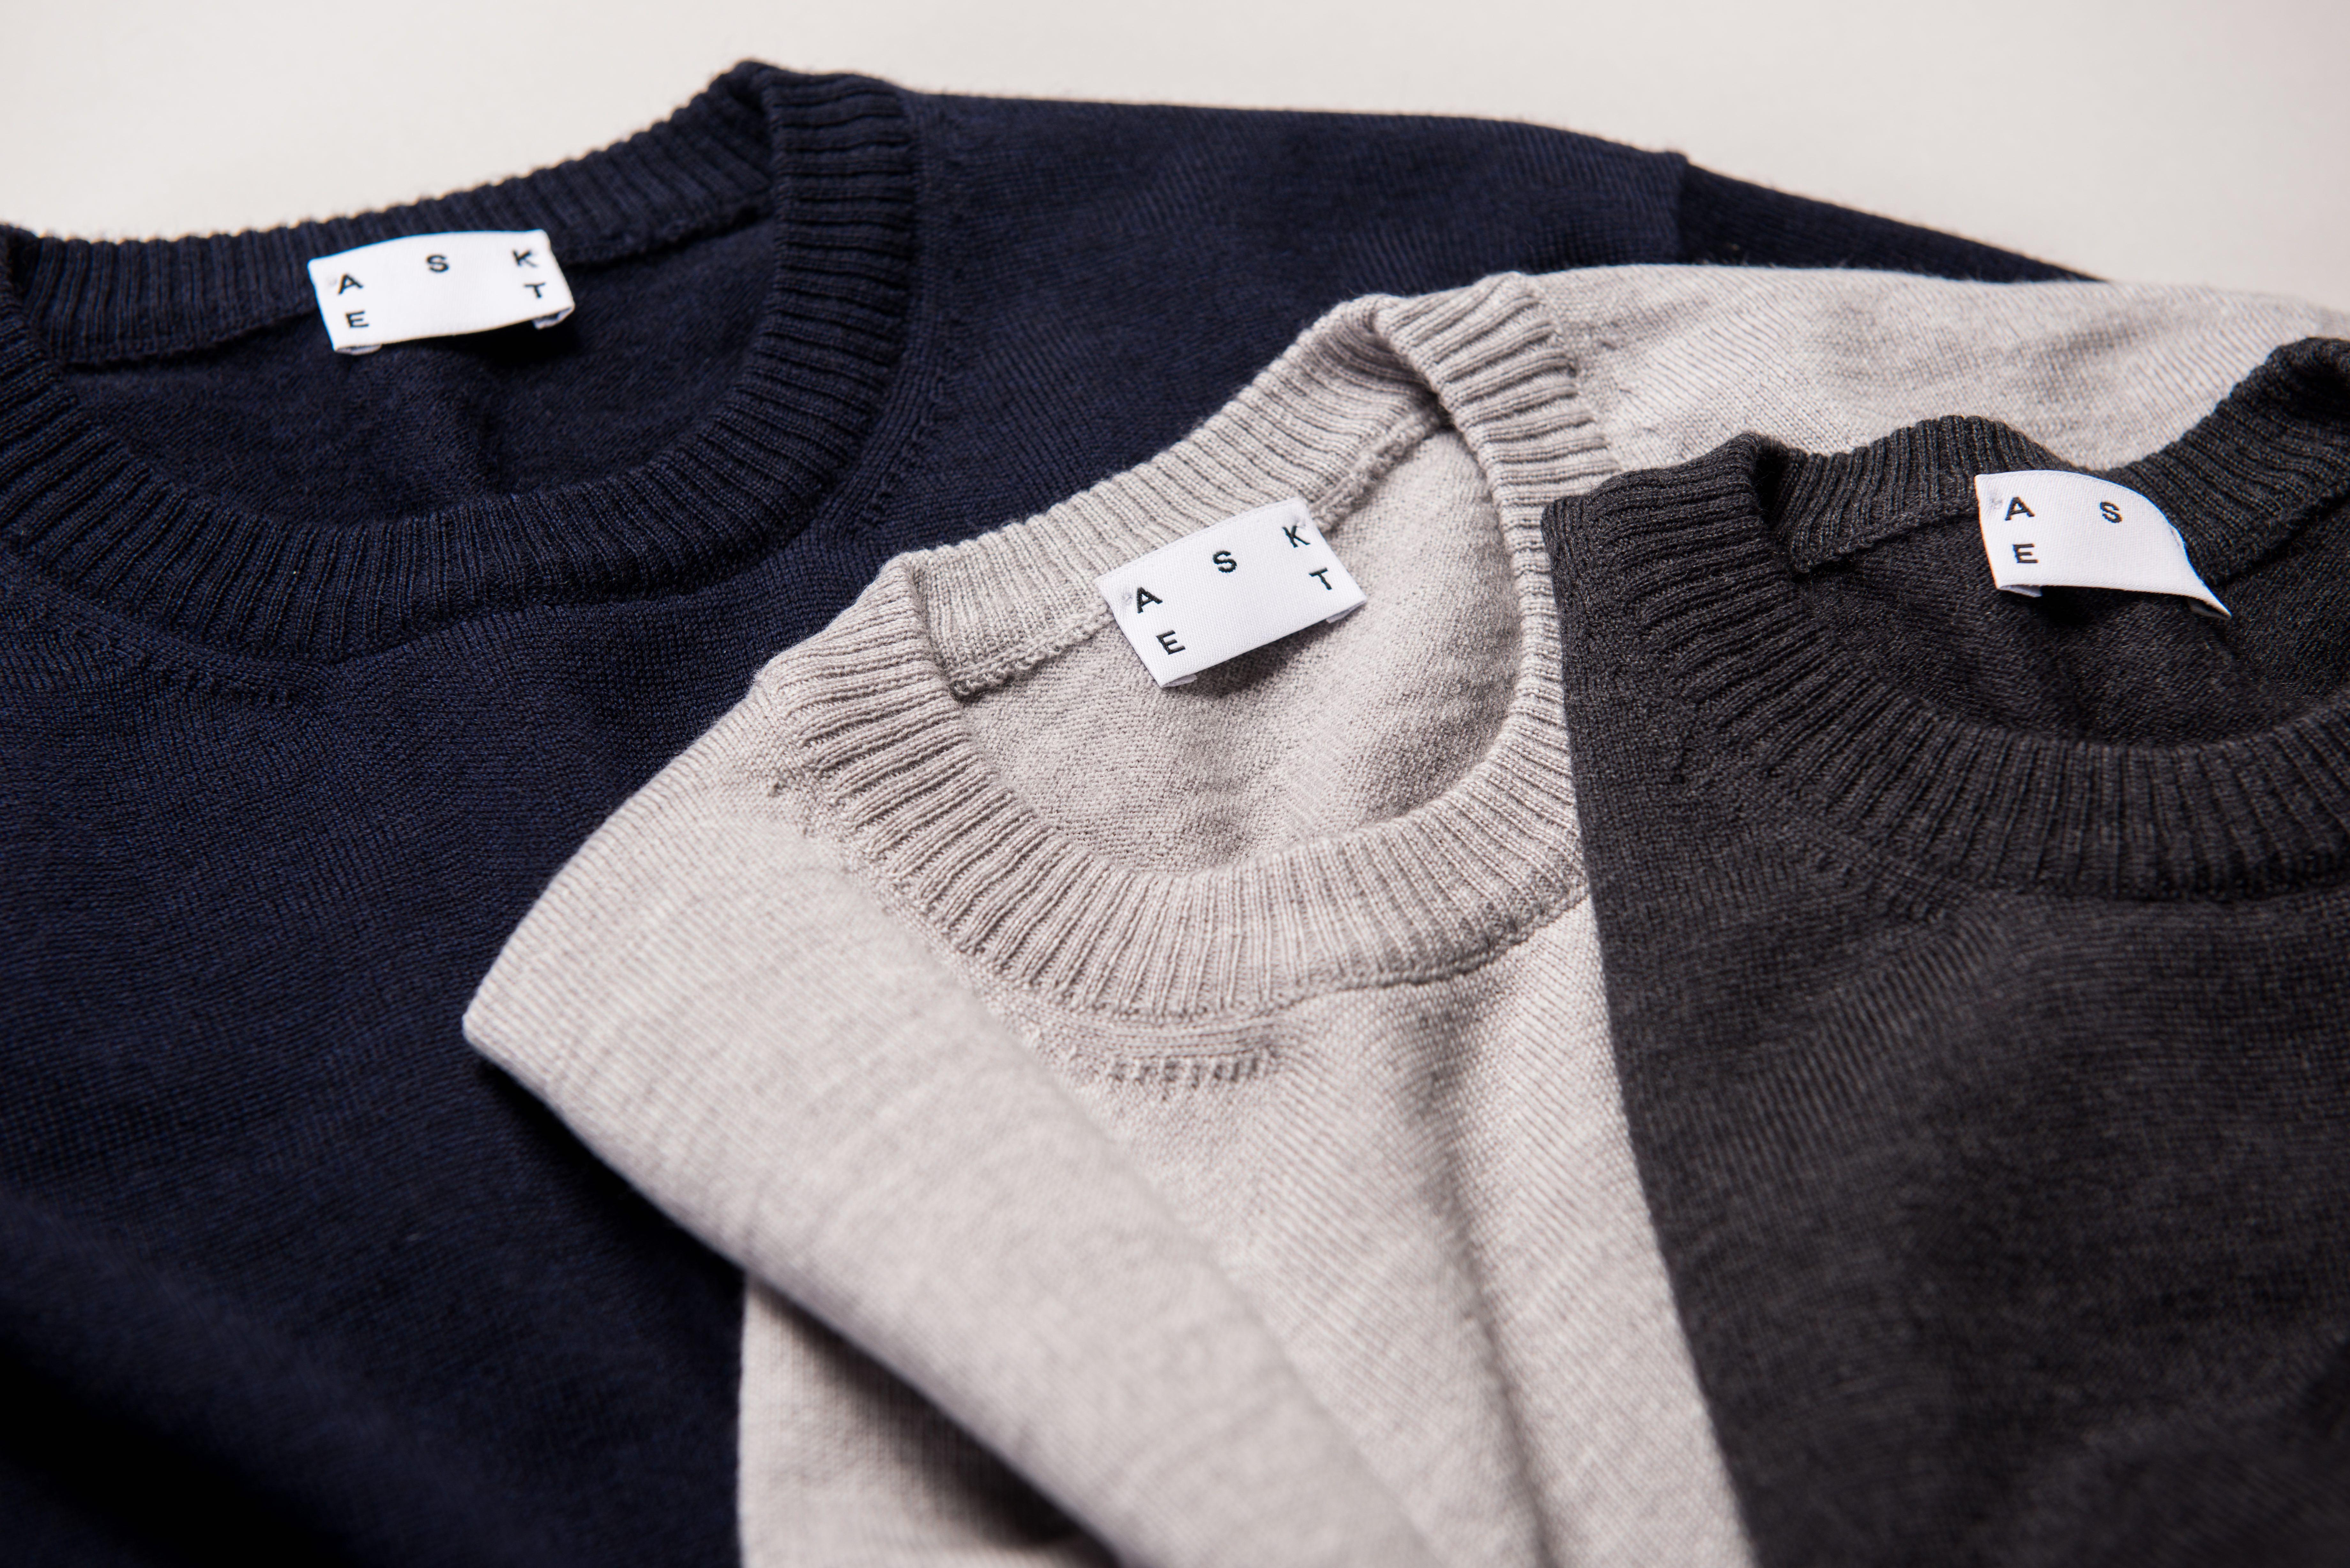 The Merino Sweater in Dark Navy, Light Grey, and Charcoal